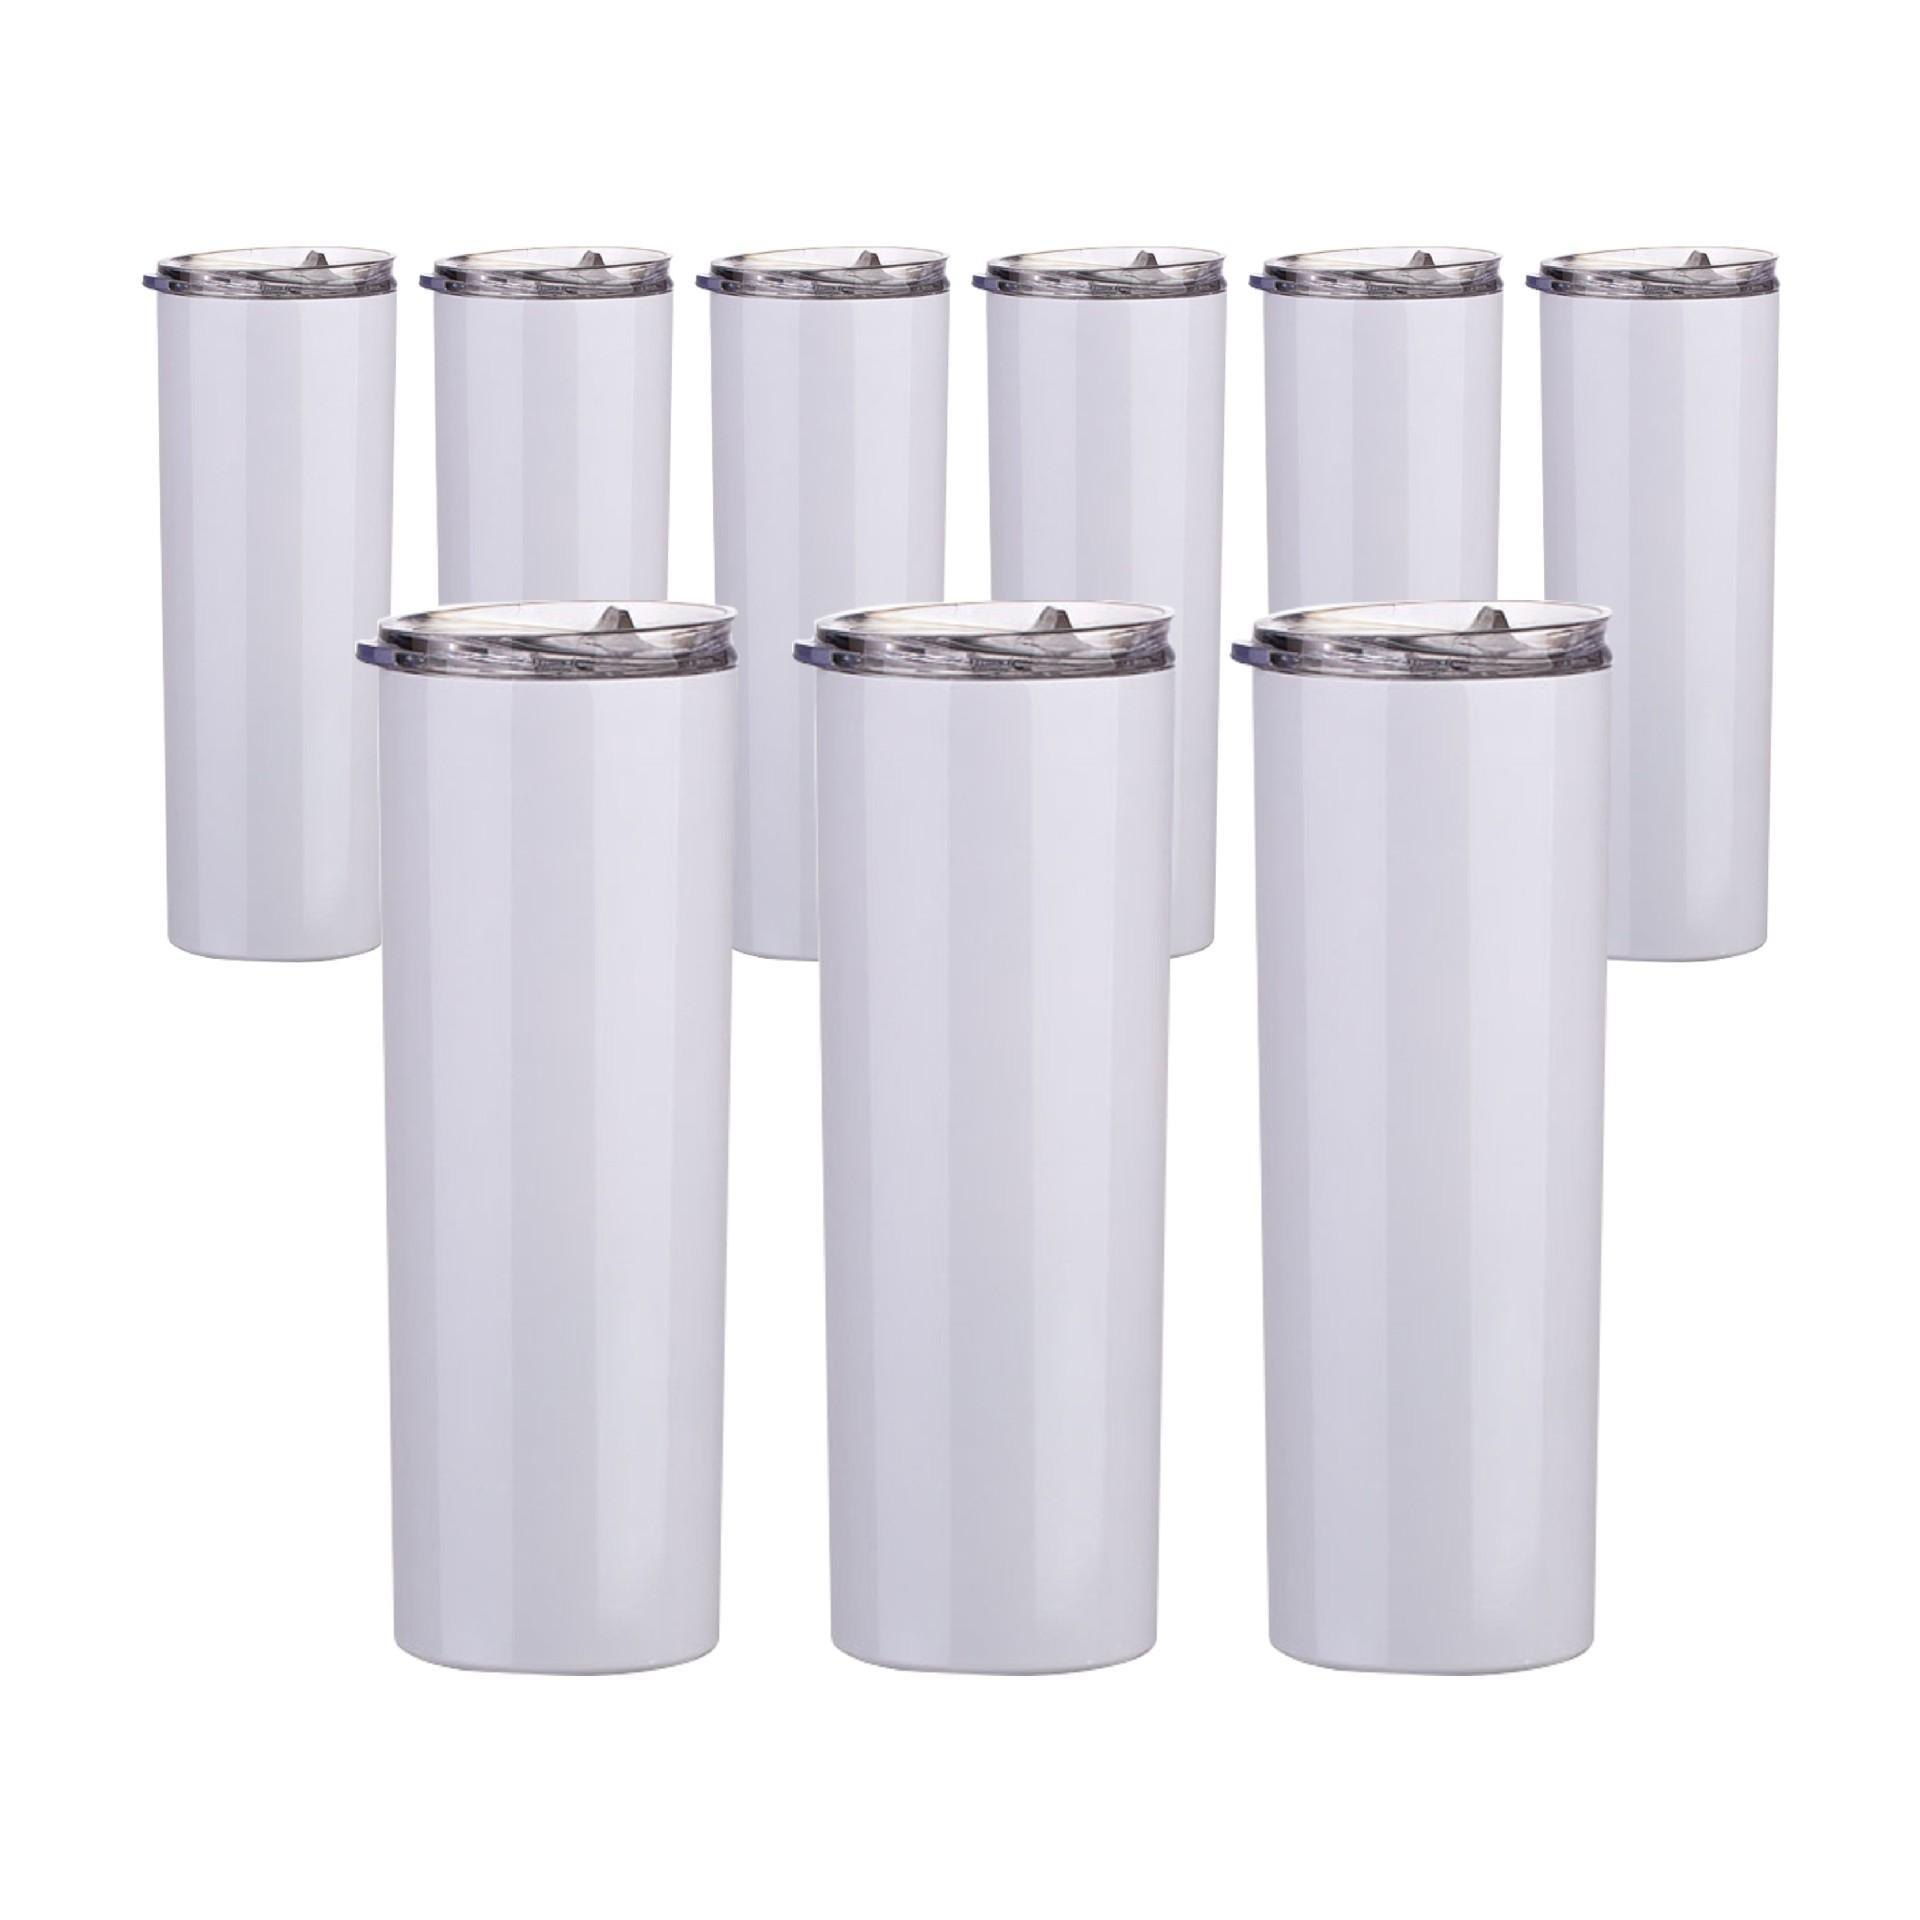 20oz 30oz 승화 레이저 인쇄 빈 흰색 스트레이트 짚 머그컵 텀블러 컵 스테인레스 스틸 이중 벽 진공 절연 물병 맞춤형 로고